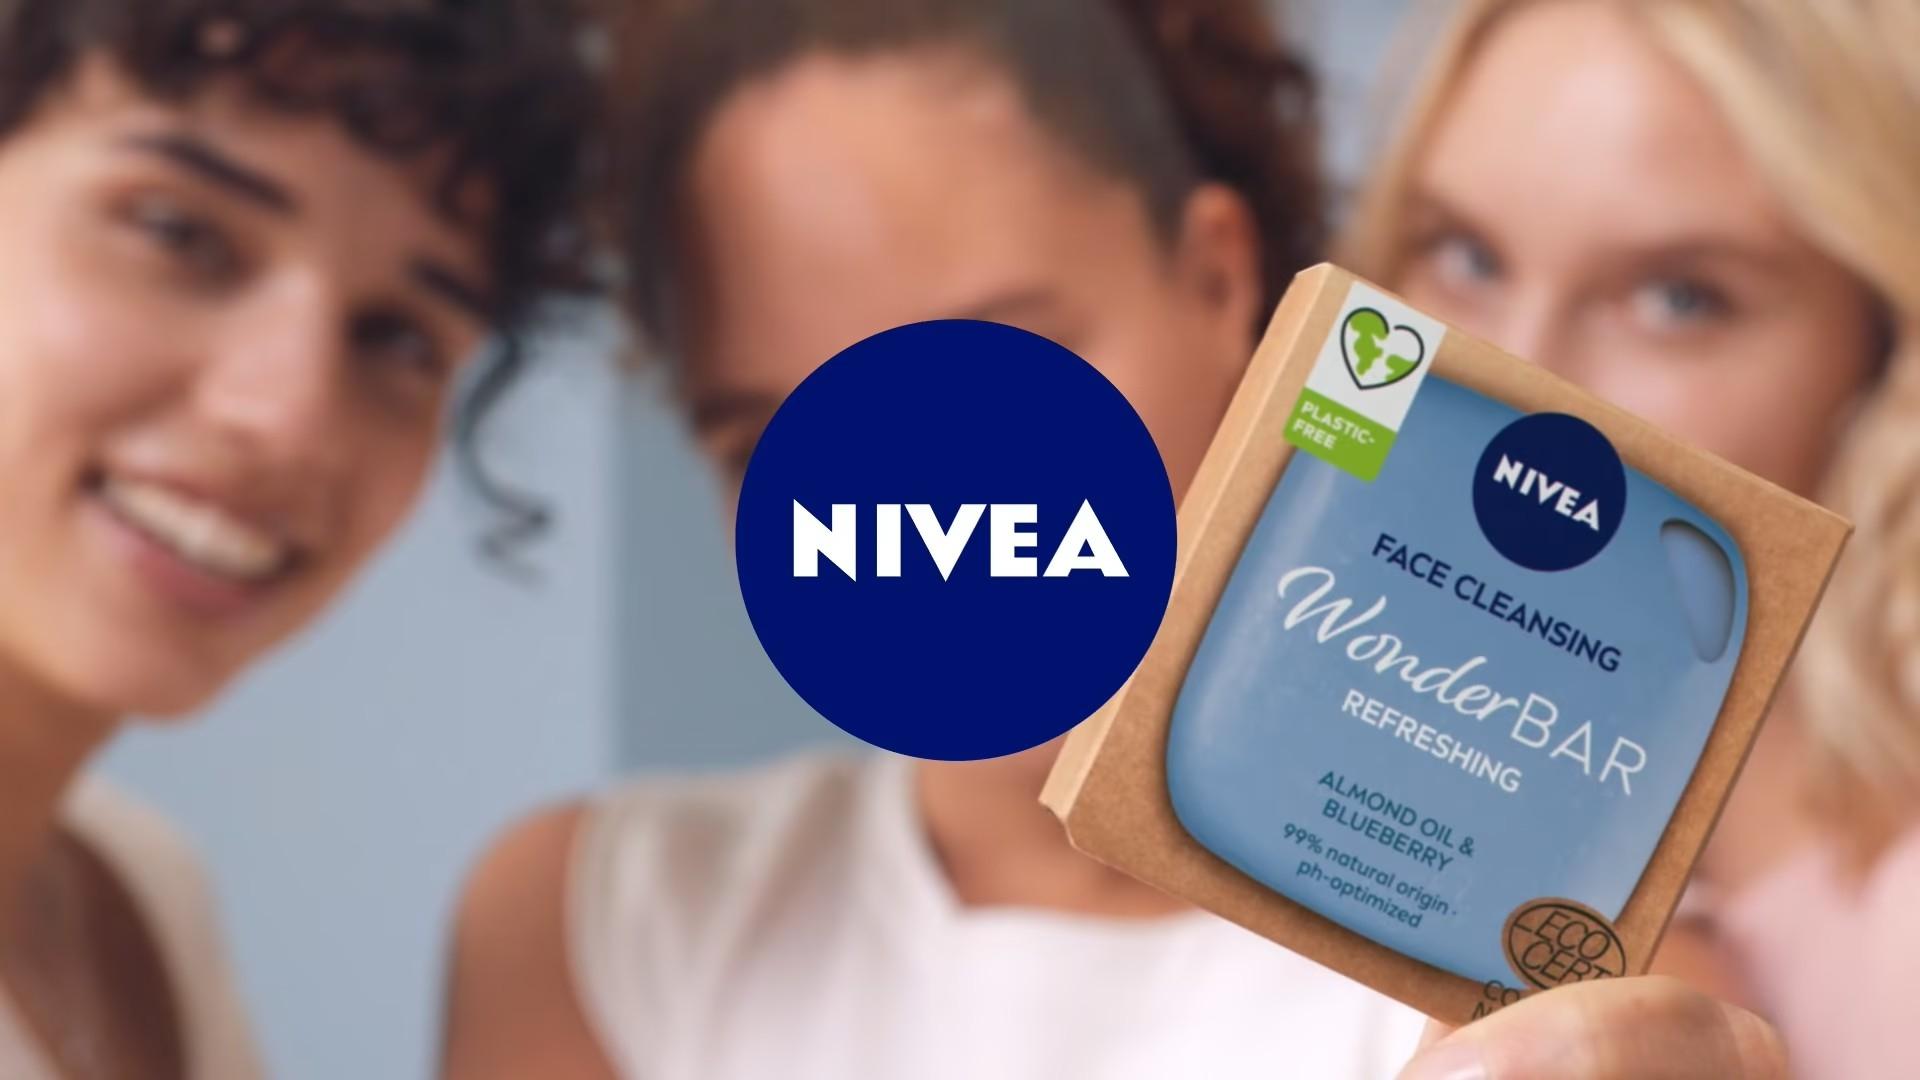 Nivea Wonderbar   Daily Clean